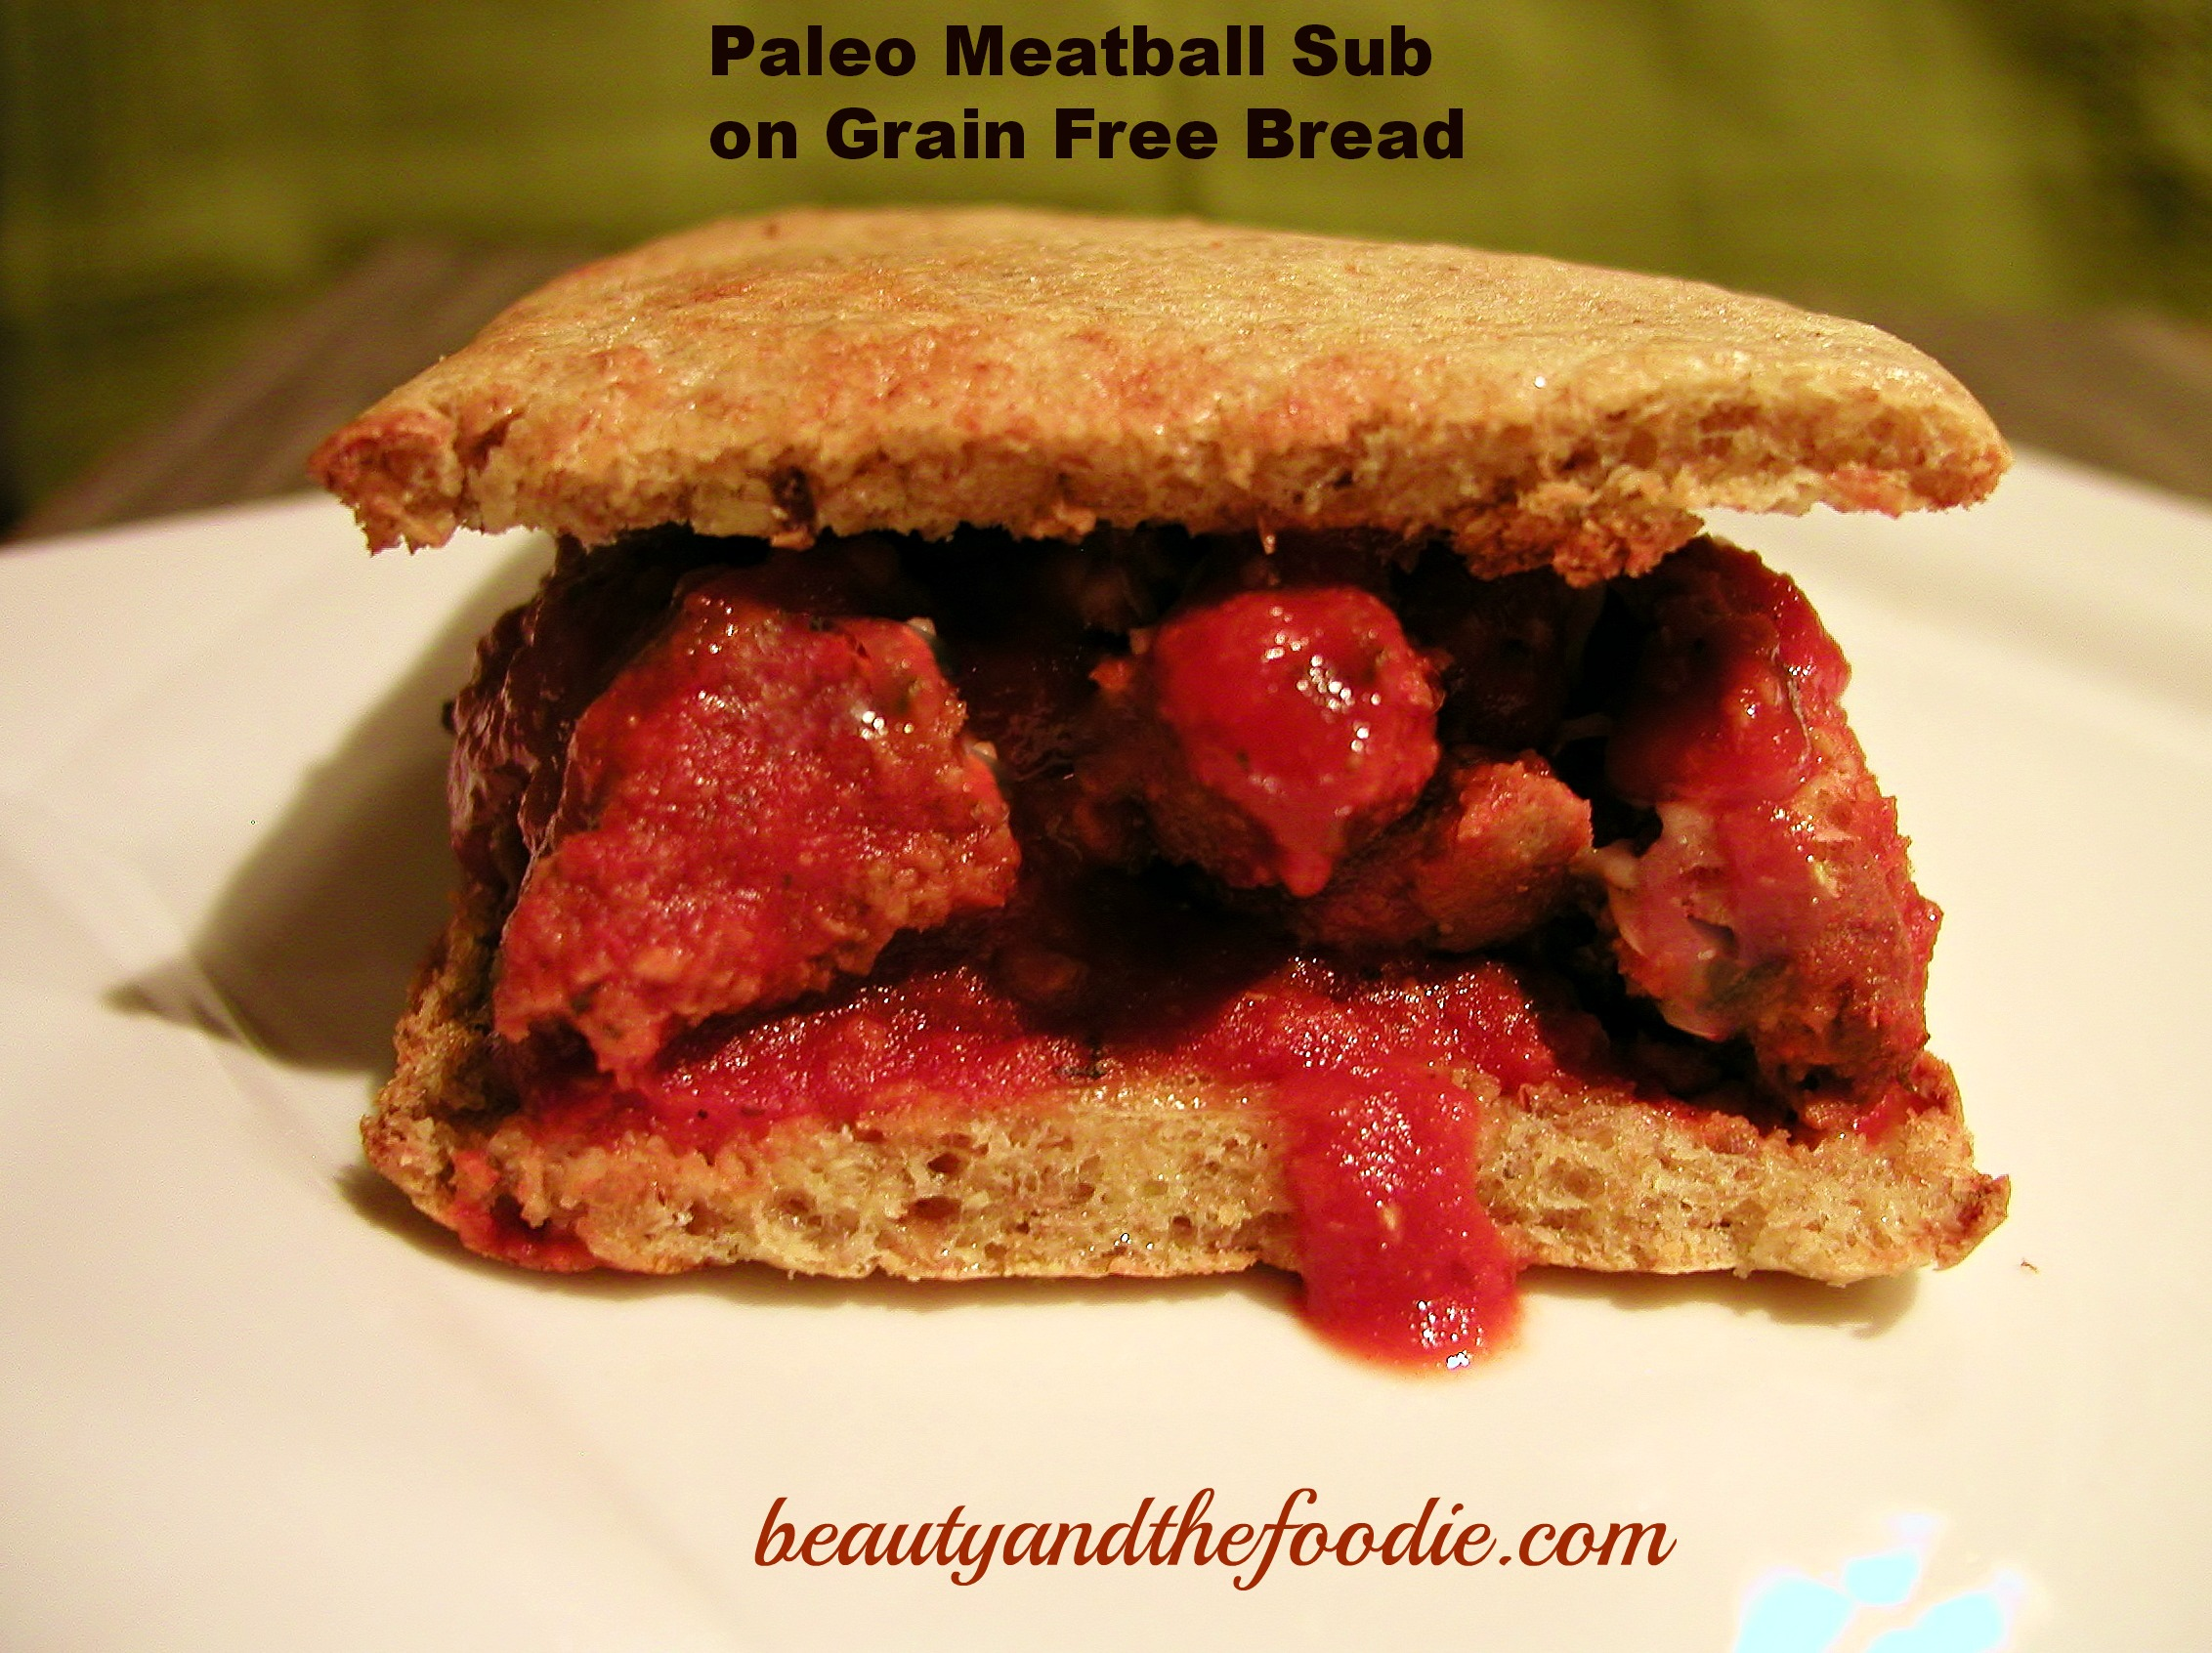 Paleo Meatball Sub/ beautyandthefoodie.com